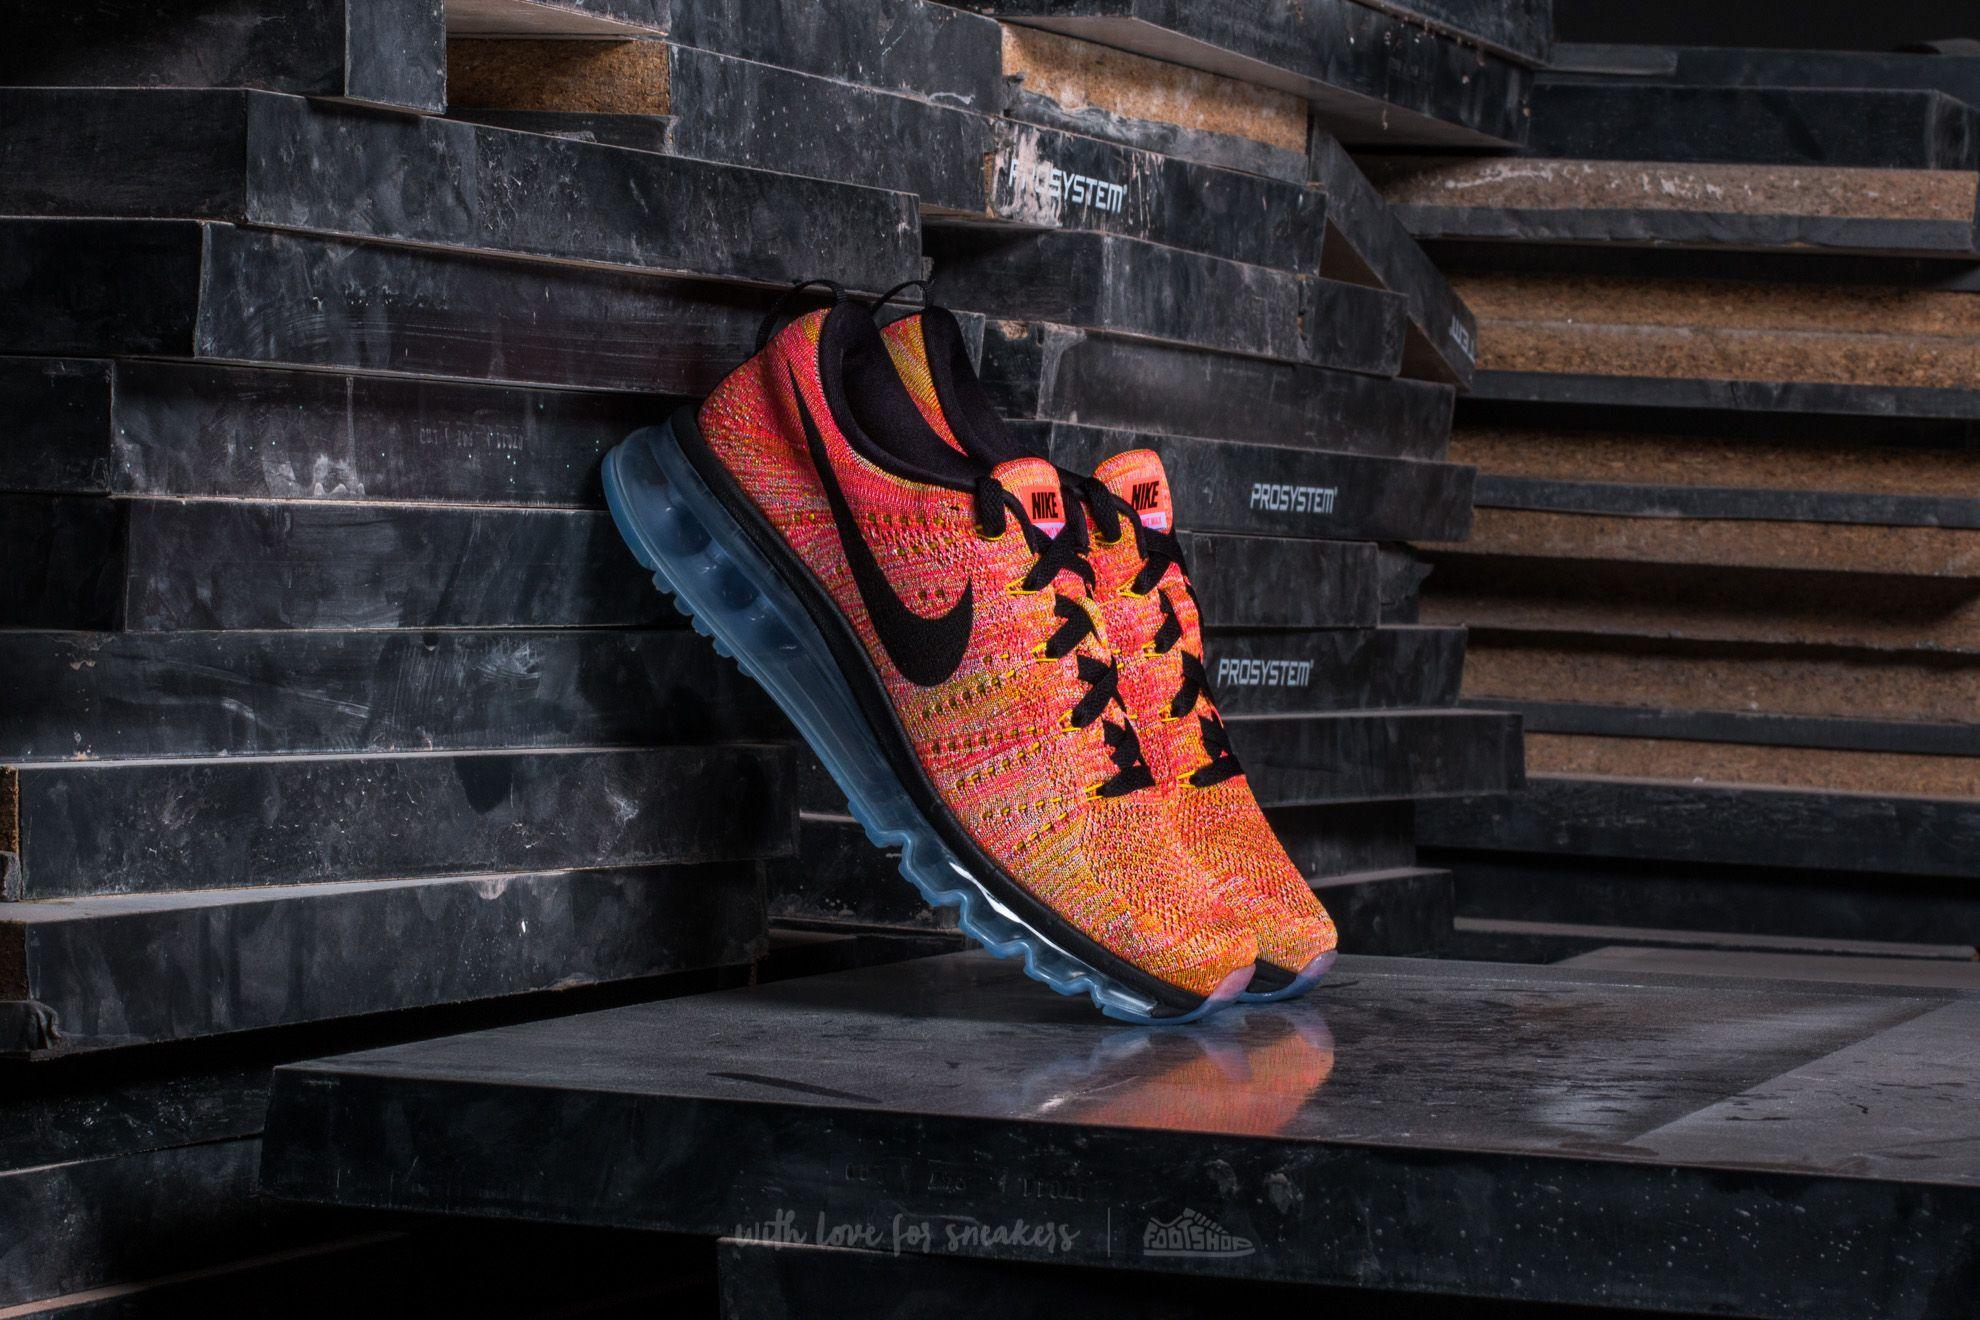 Nike Wmns Flyknit Max Aluminum/ Black-Hot Punch